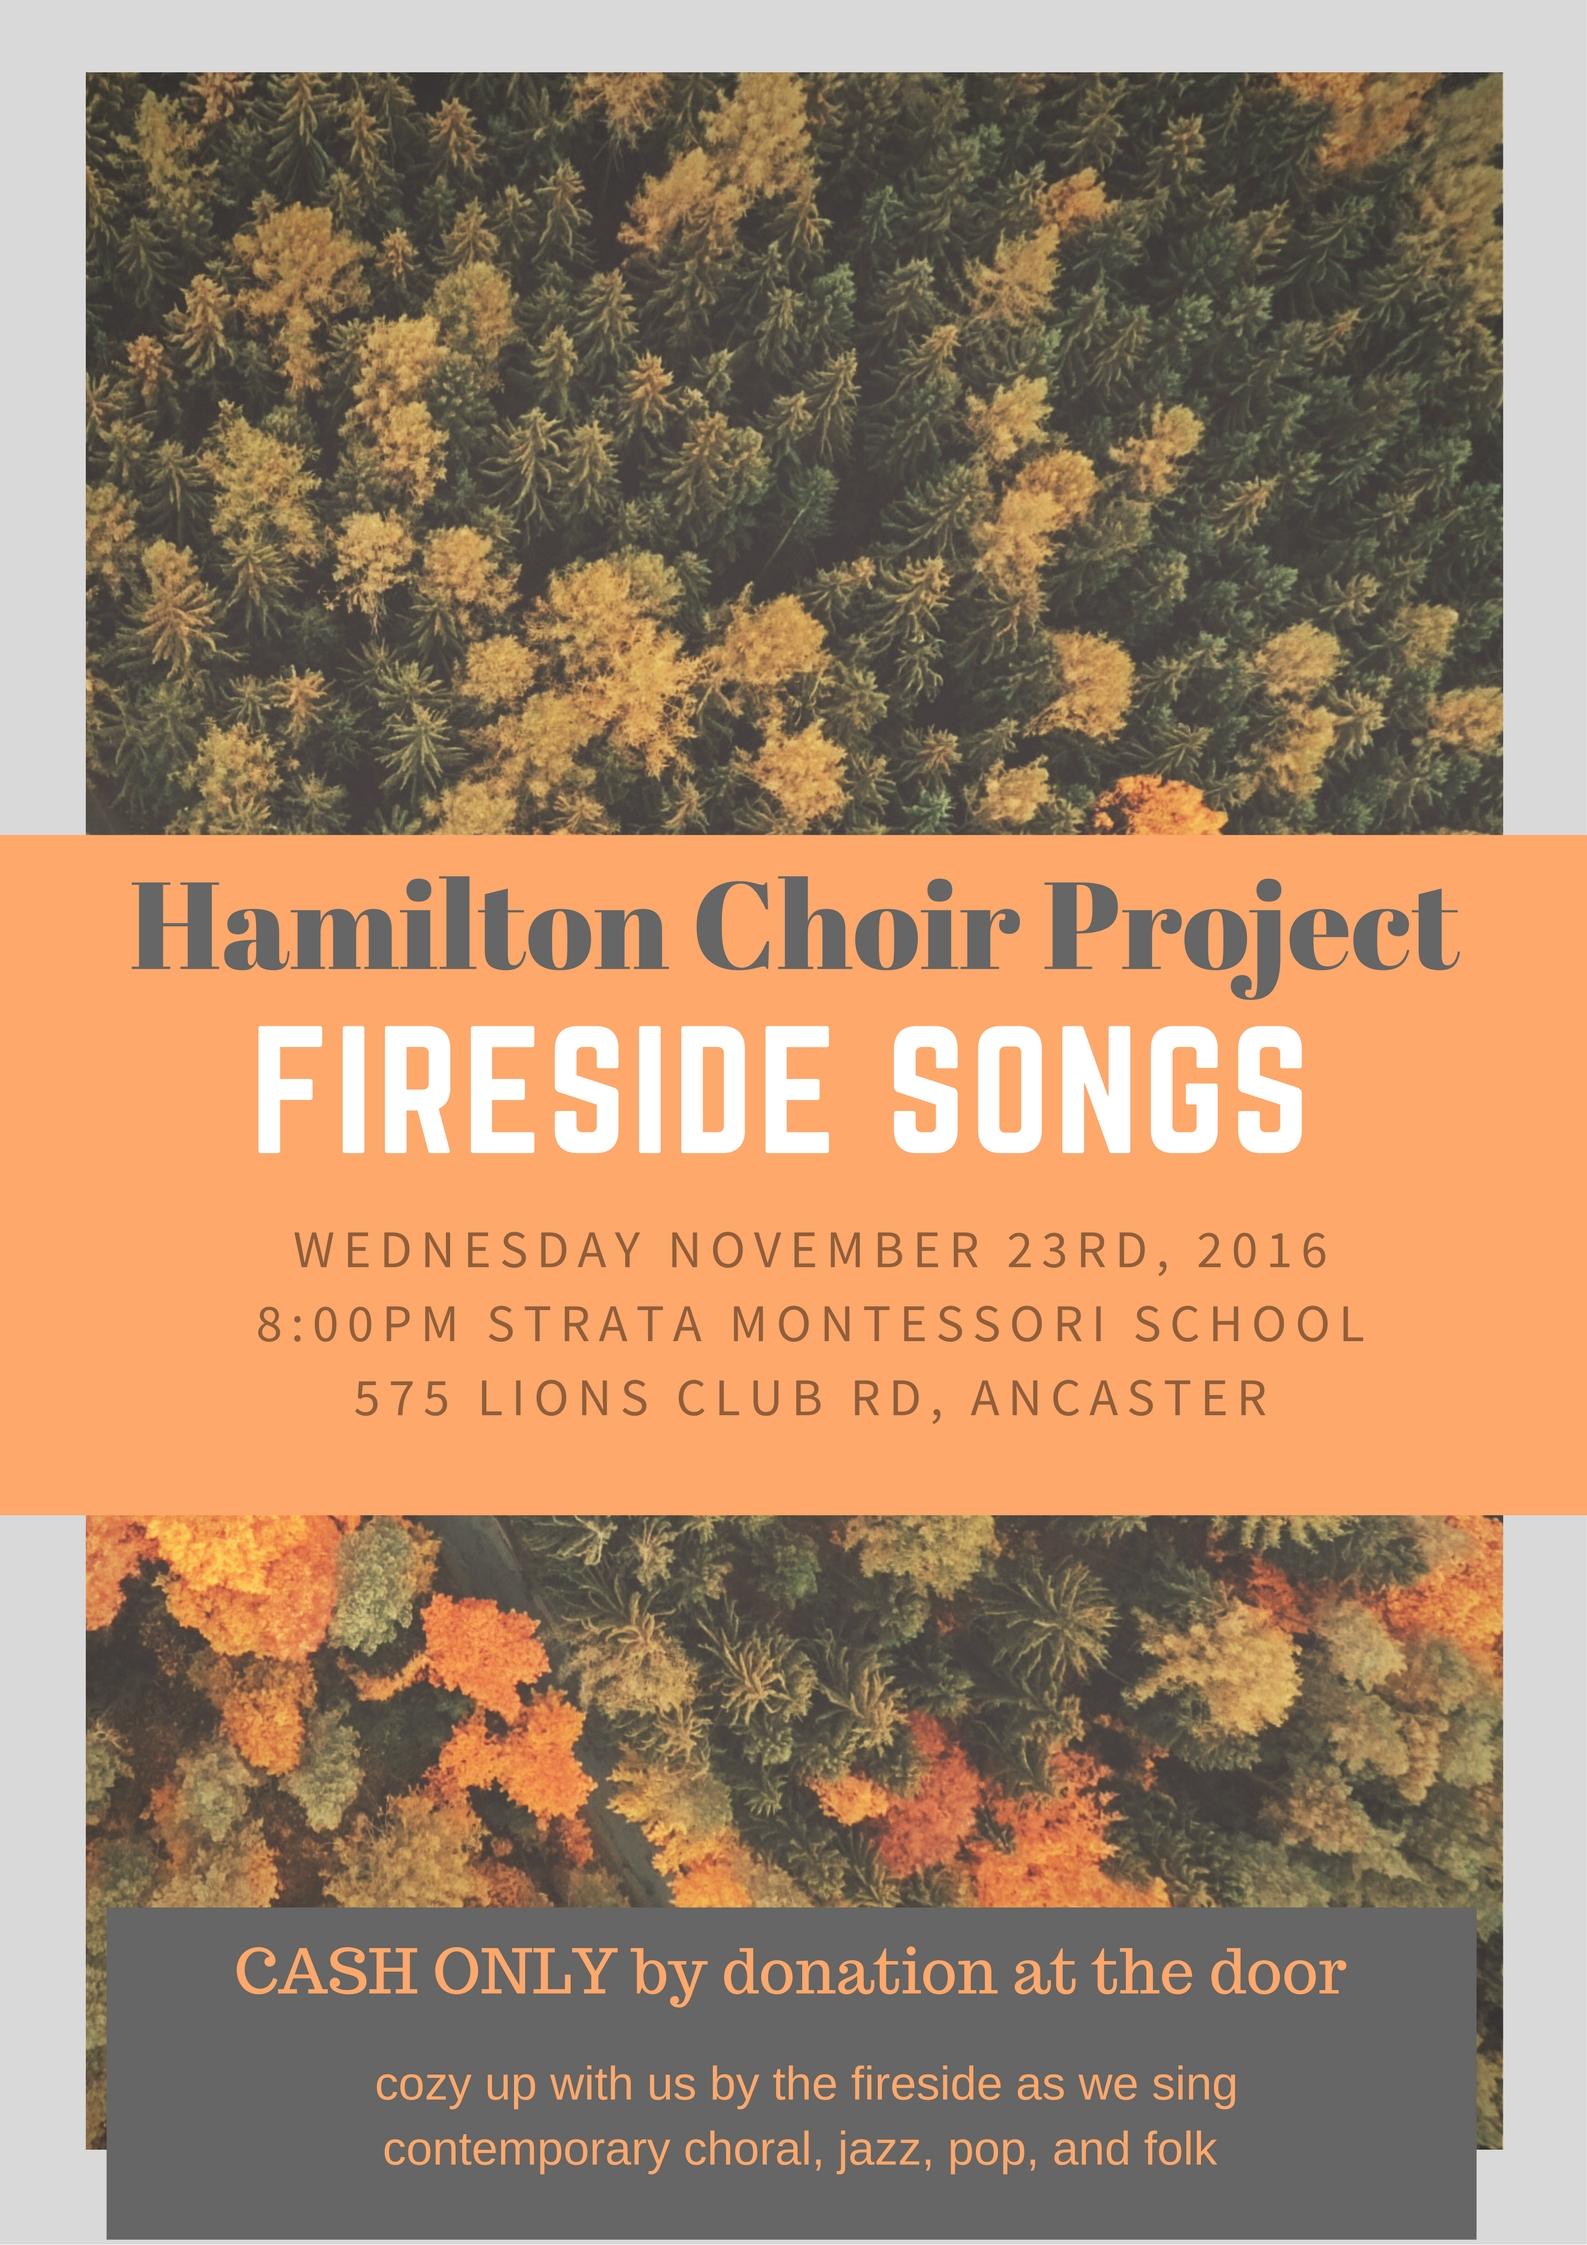 fireside-songs